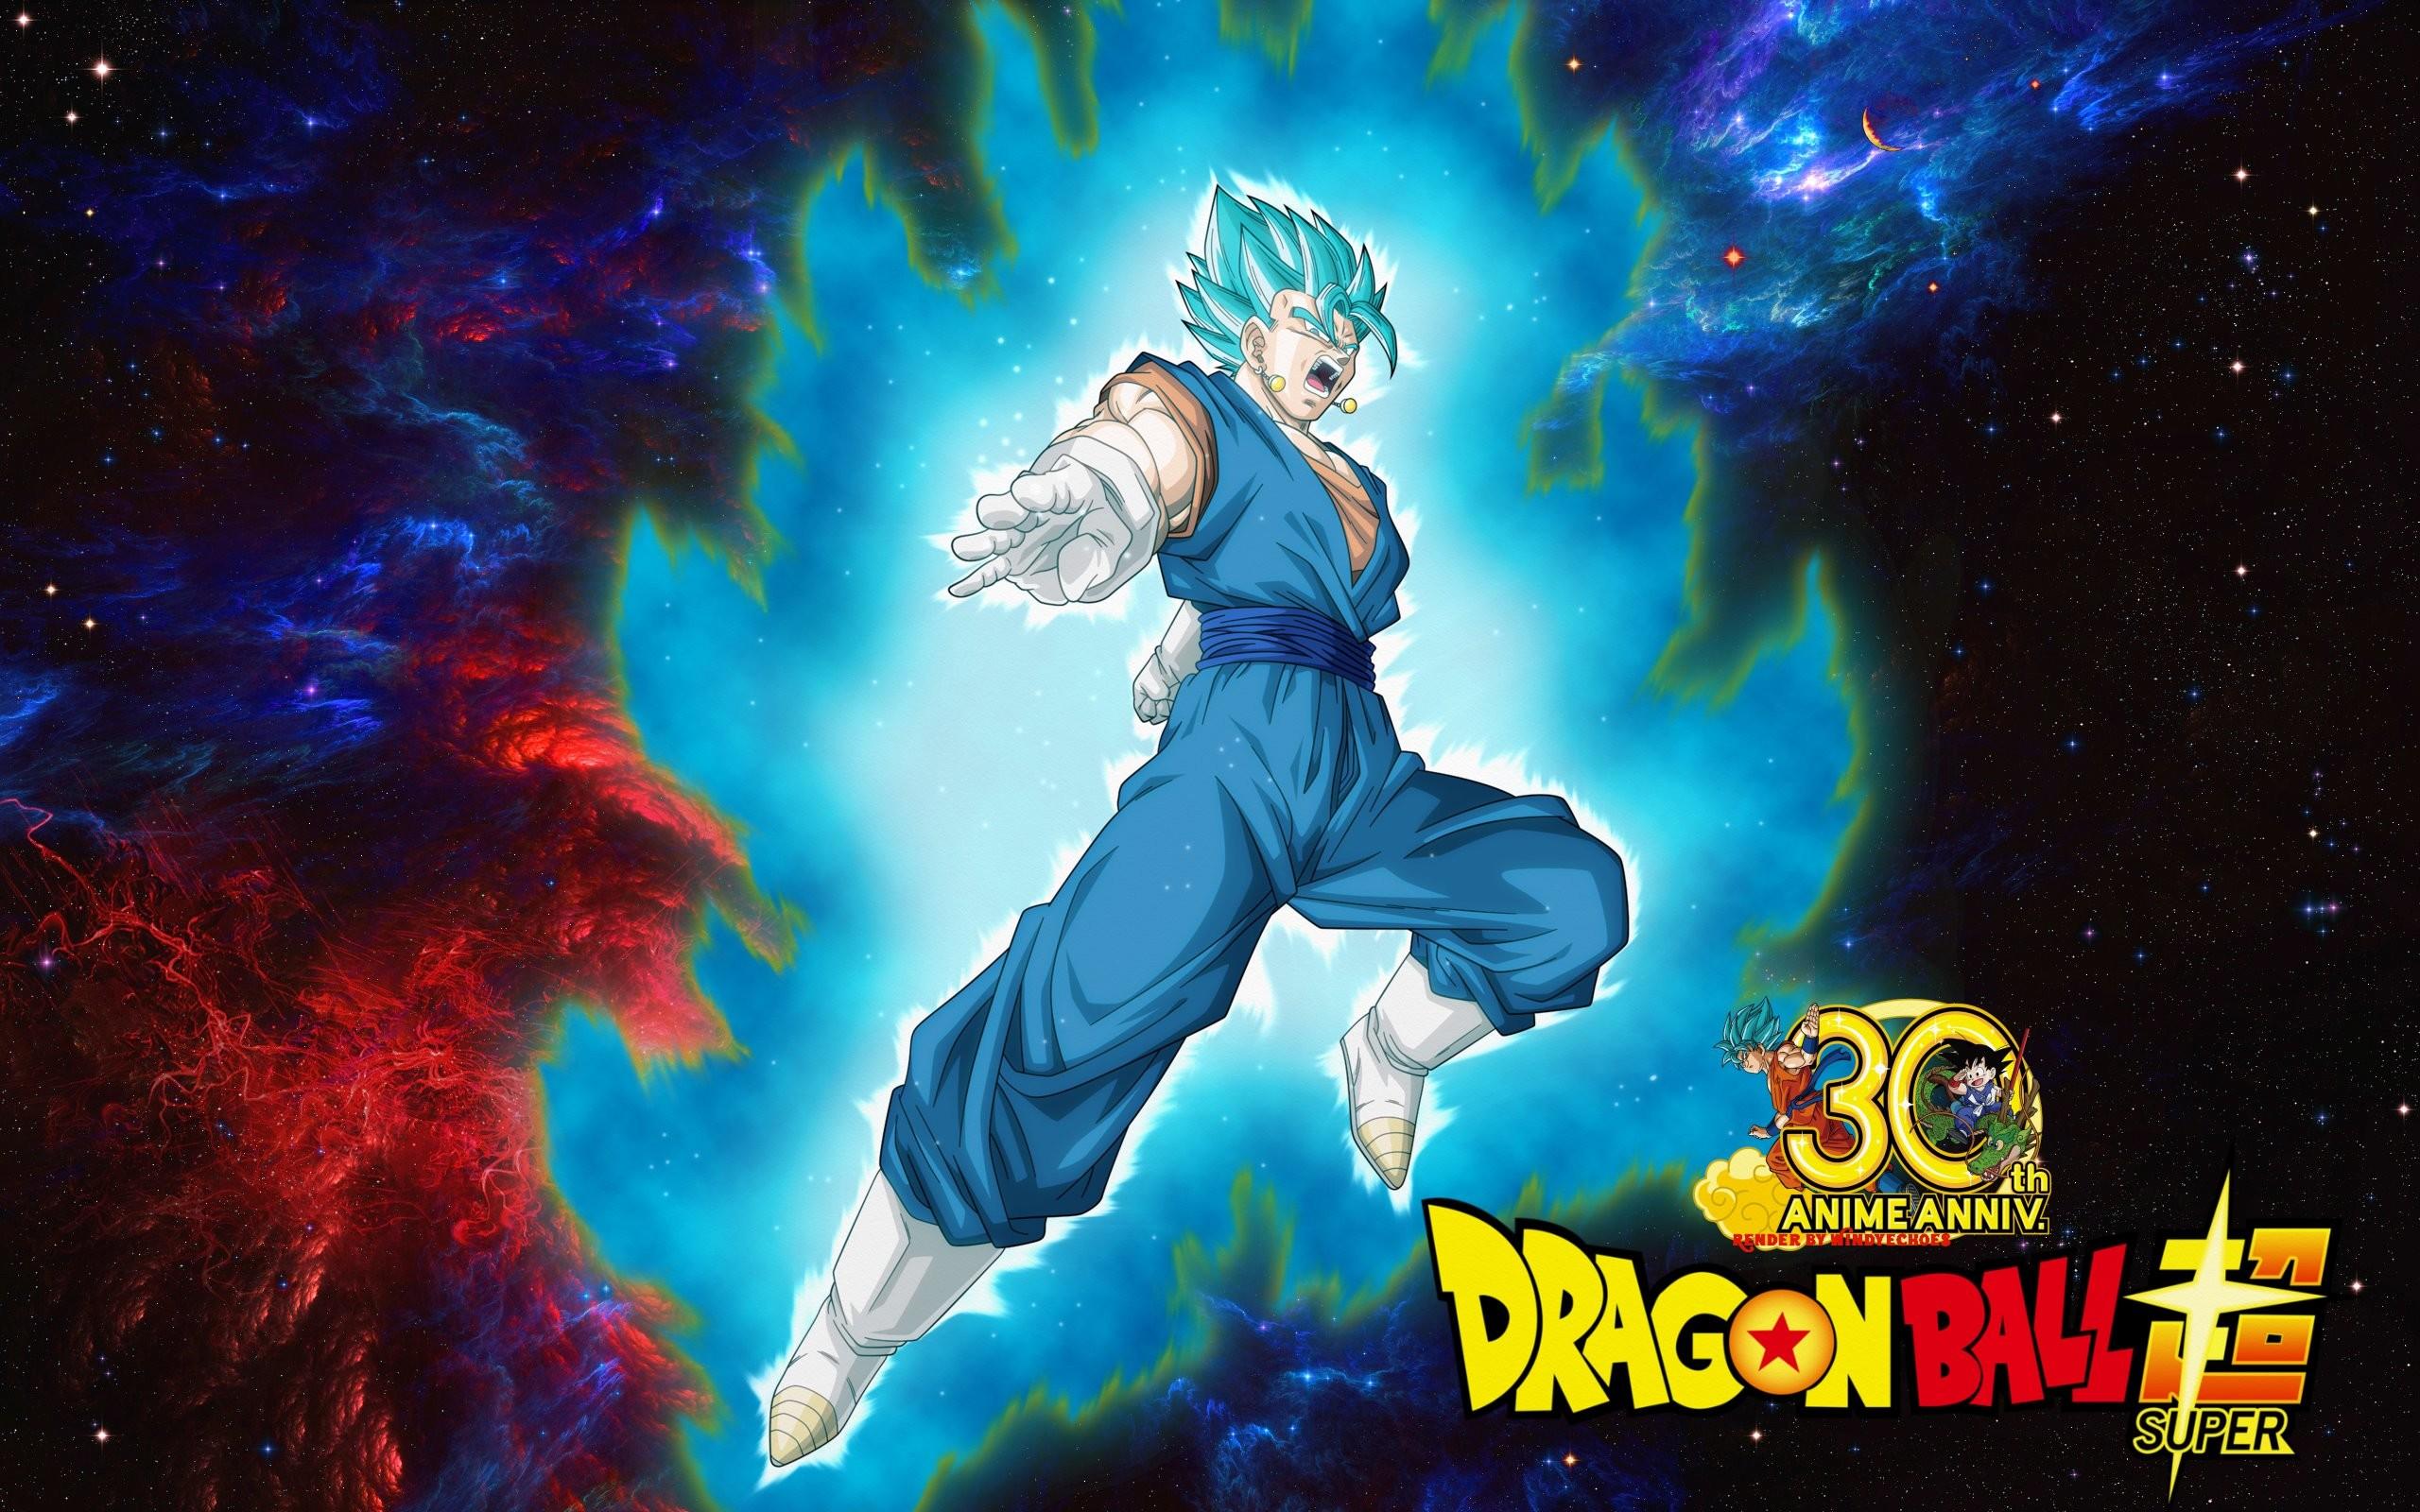 … Dragon Ball Super Wallpaper – Vegito Saiyan Blue by WindyEchoes